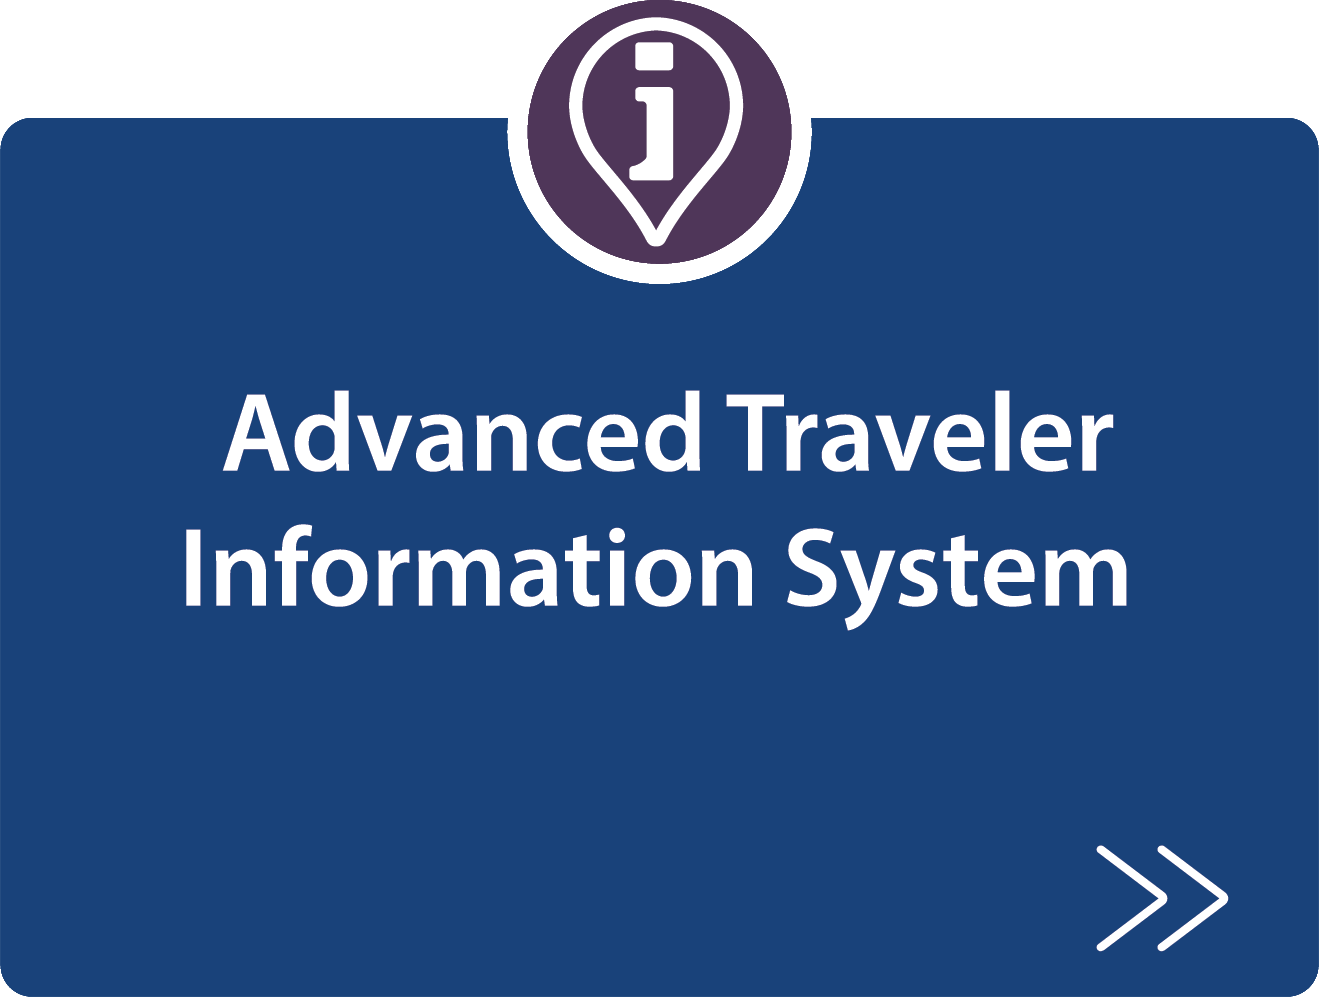 Advanced Traveler Information System strategy description